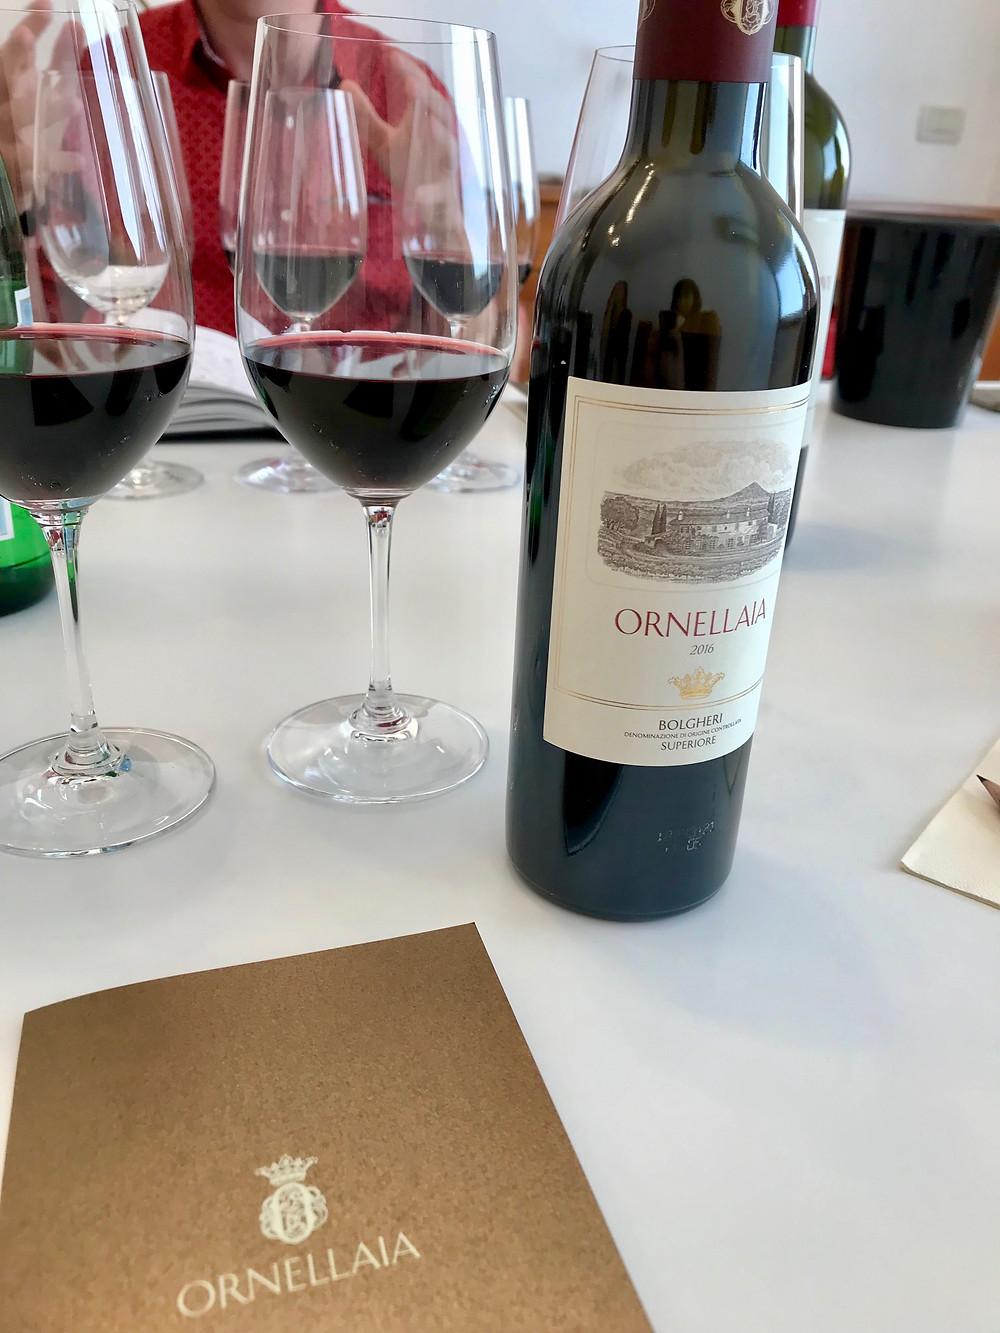 Top Tuscany wines